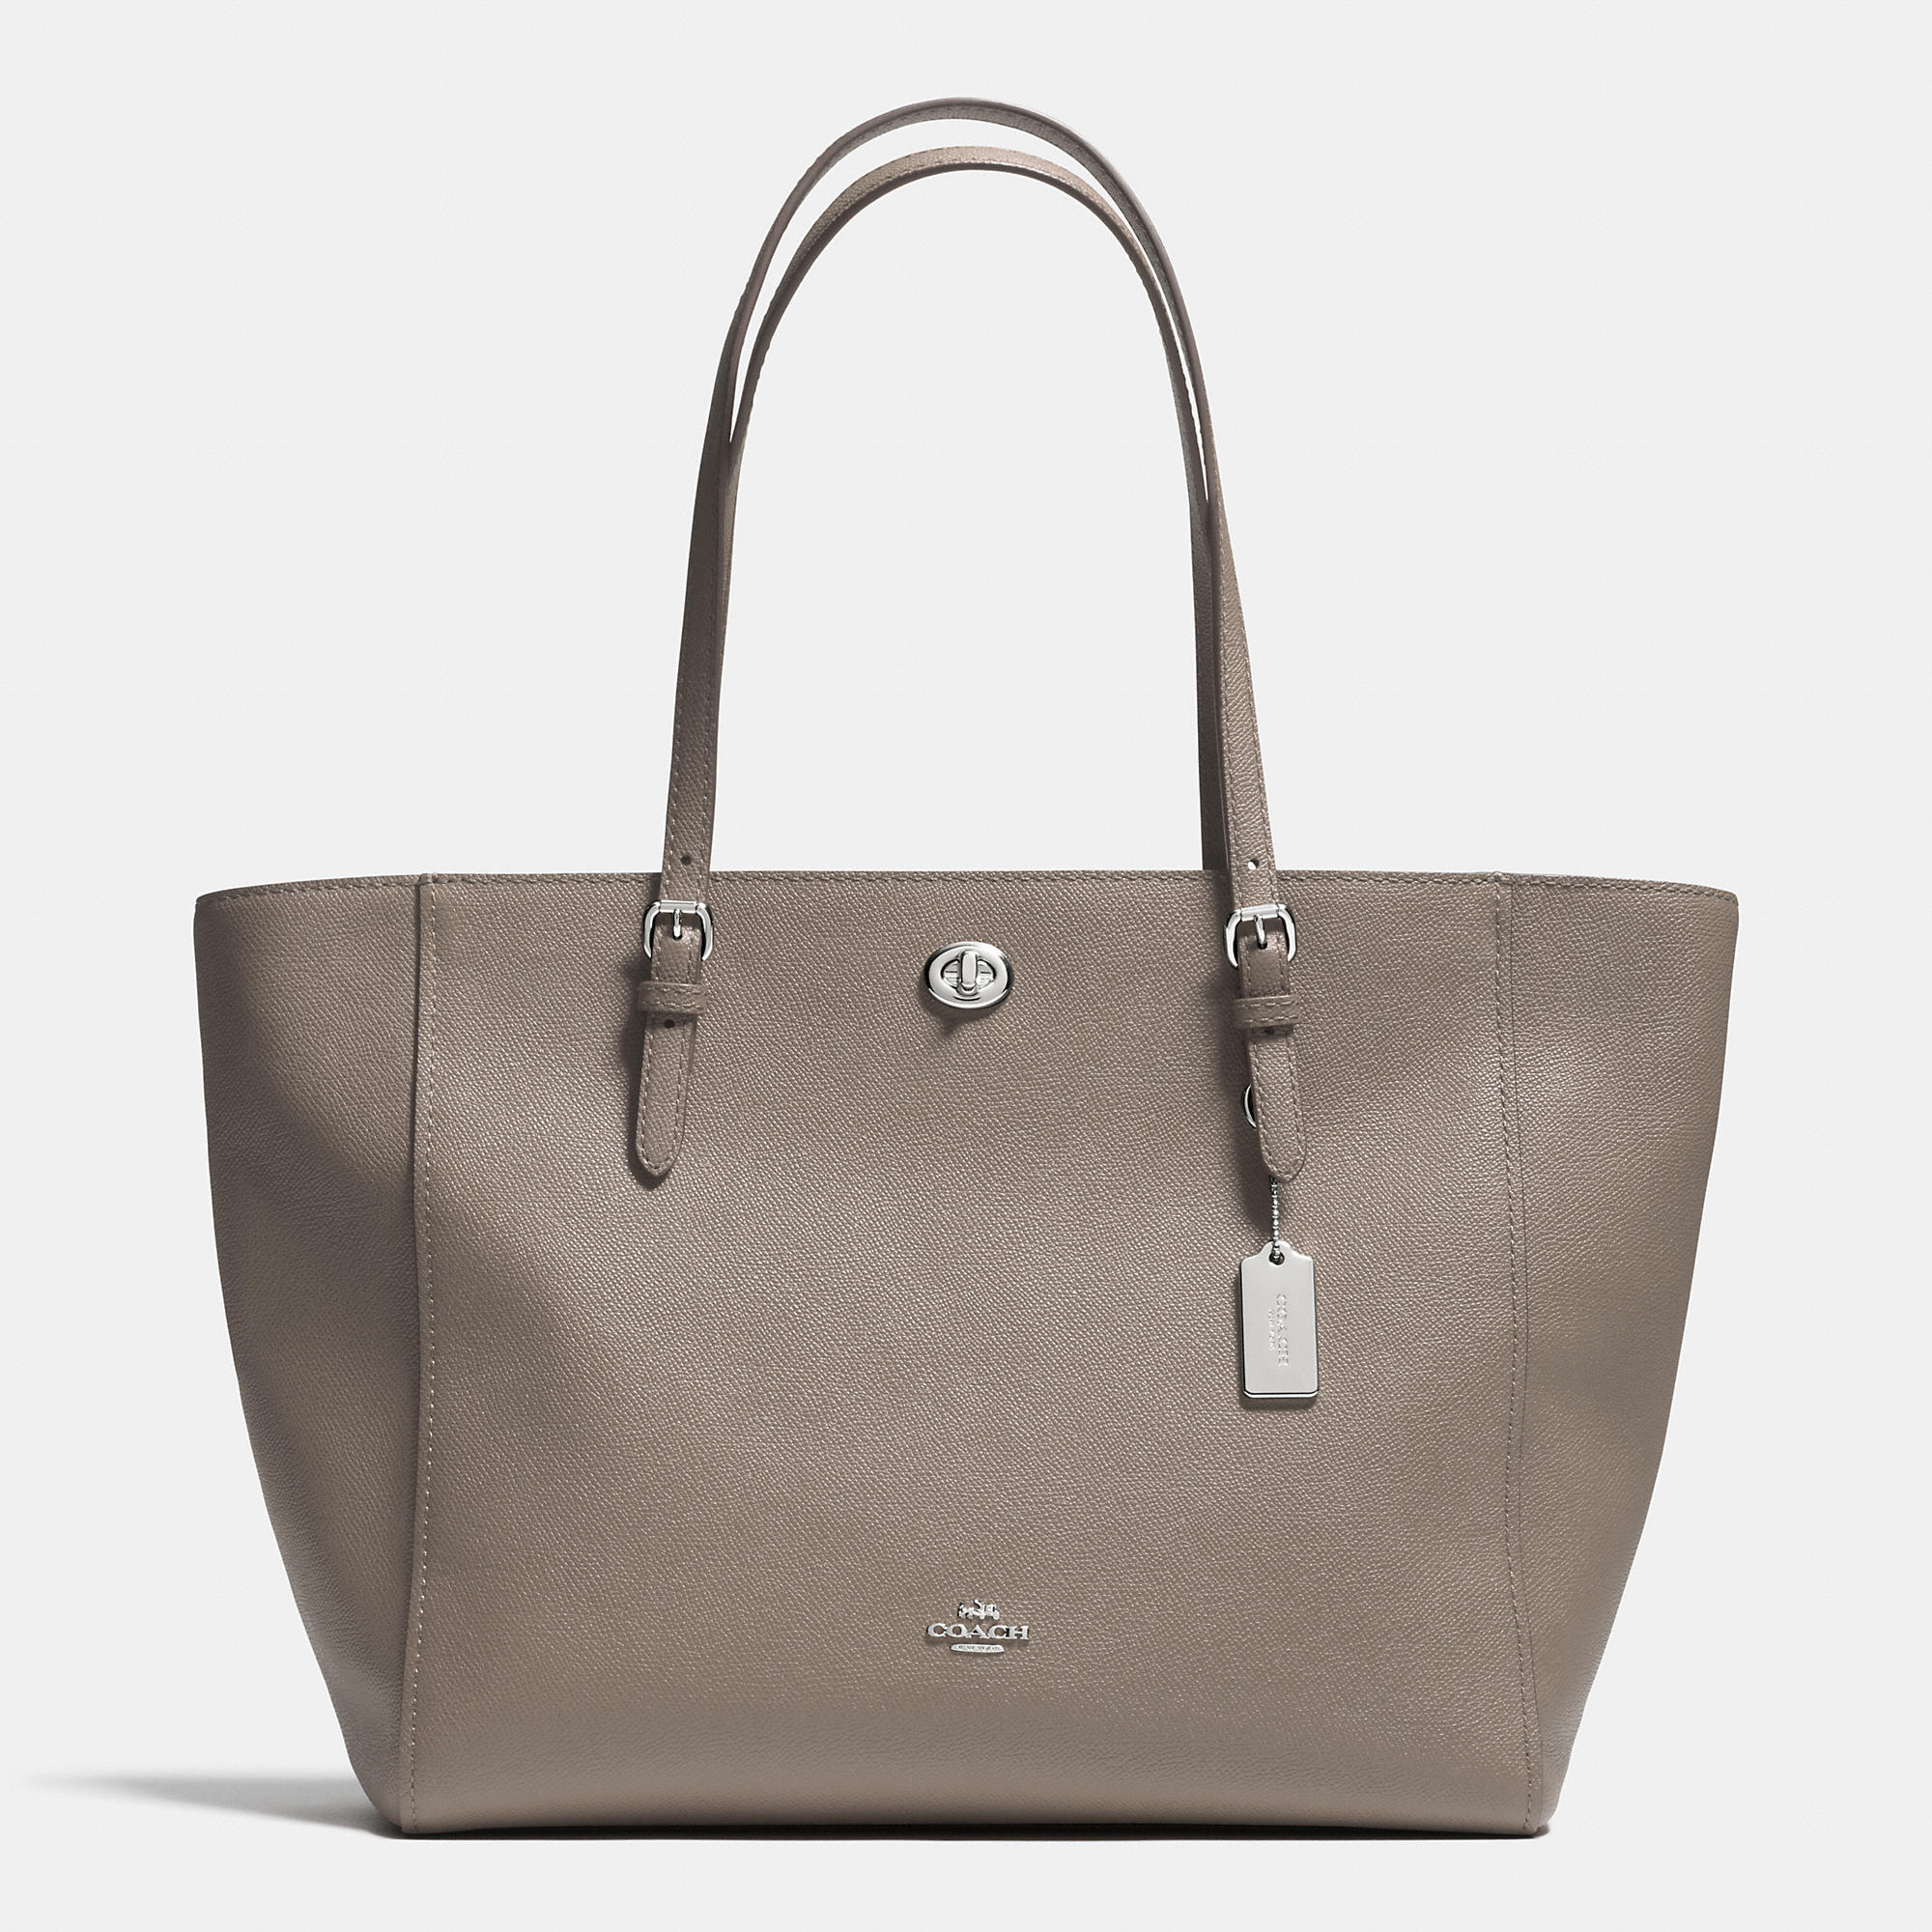 Silver leather tote bag uk - Turnlock Tote In Crossgrain Leather